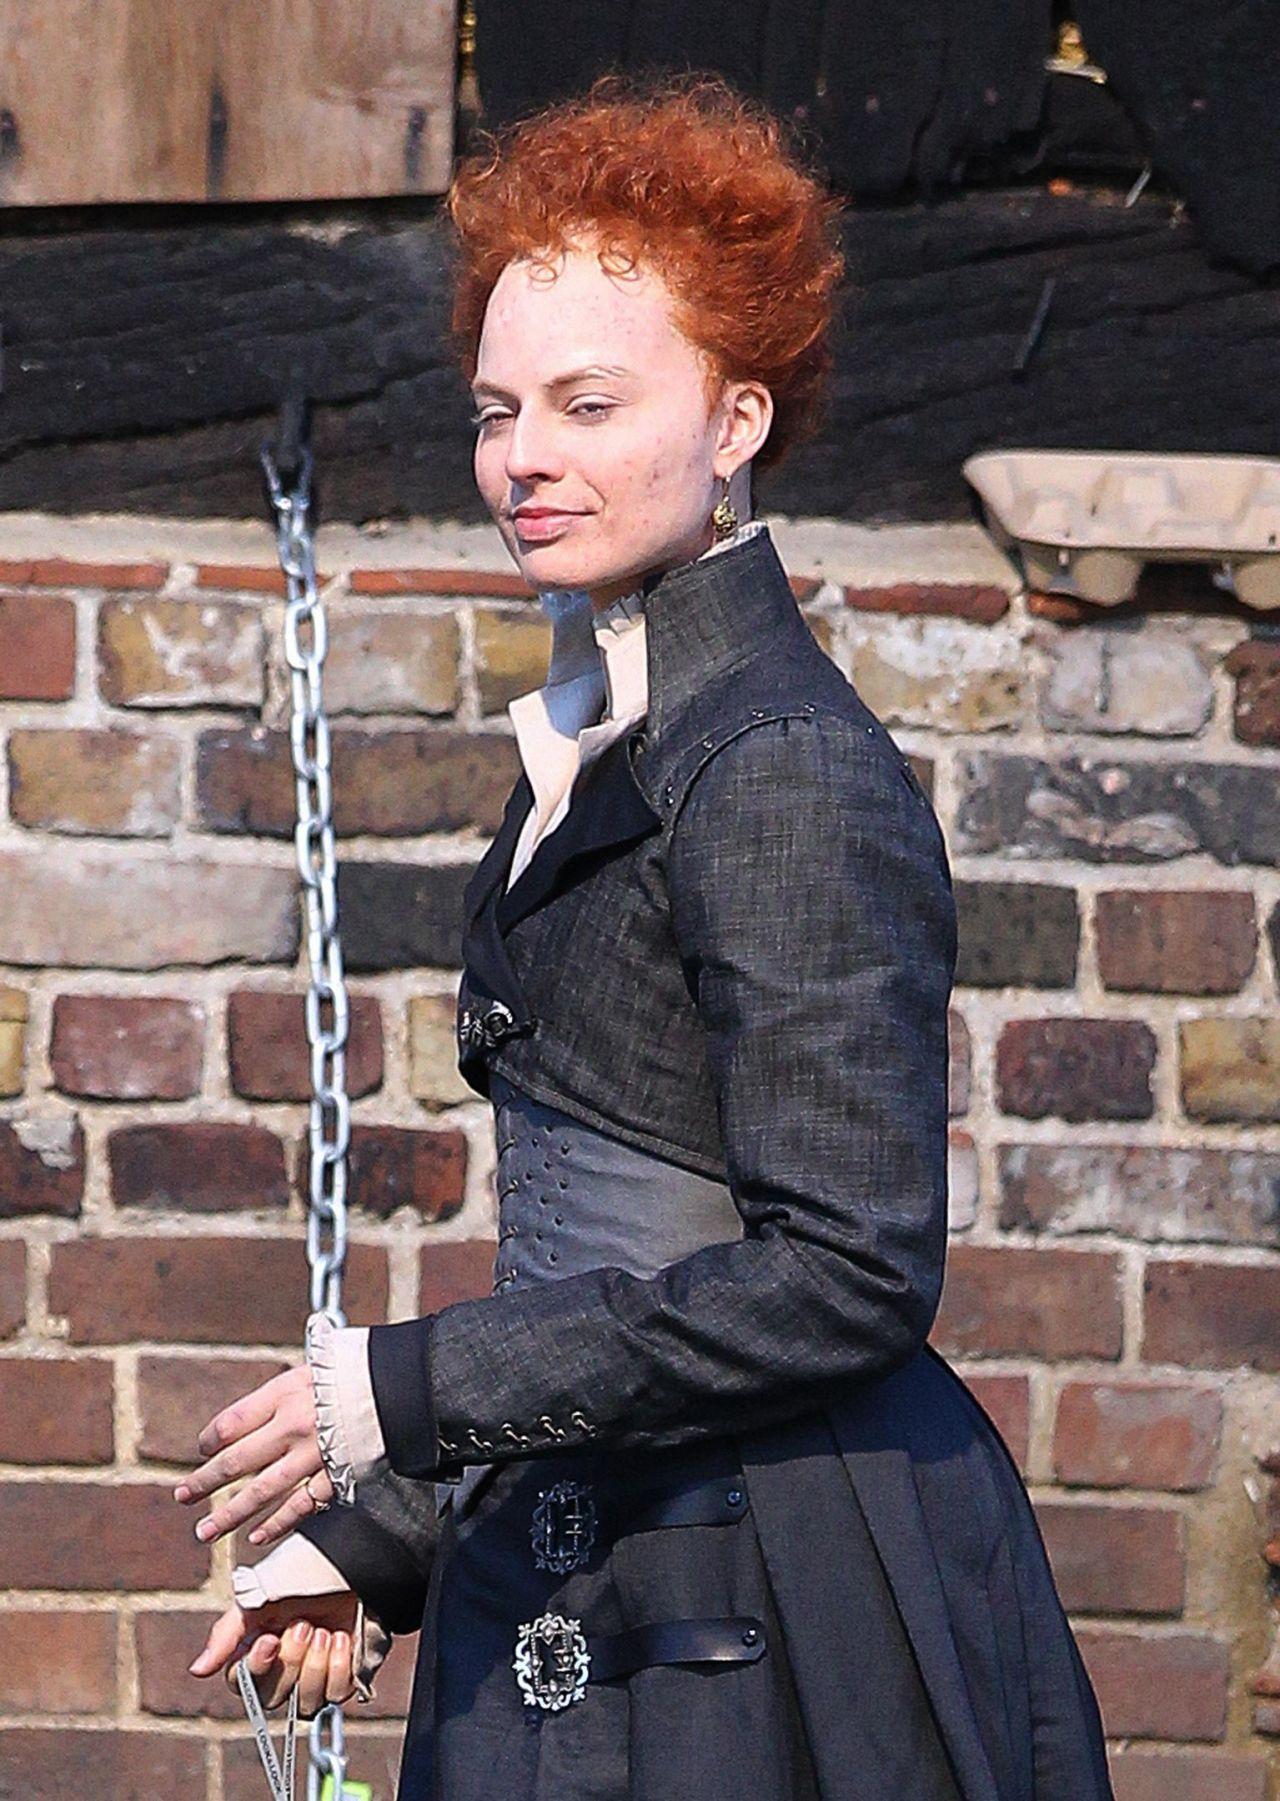 margot robbie quotmary queen of scotsquot movie set in london